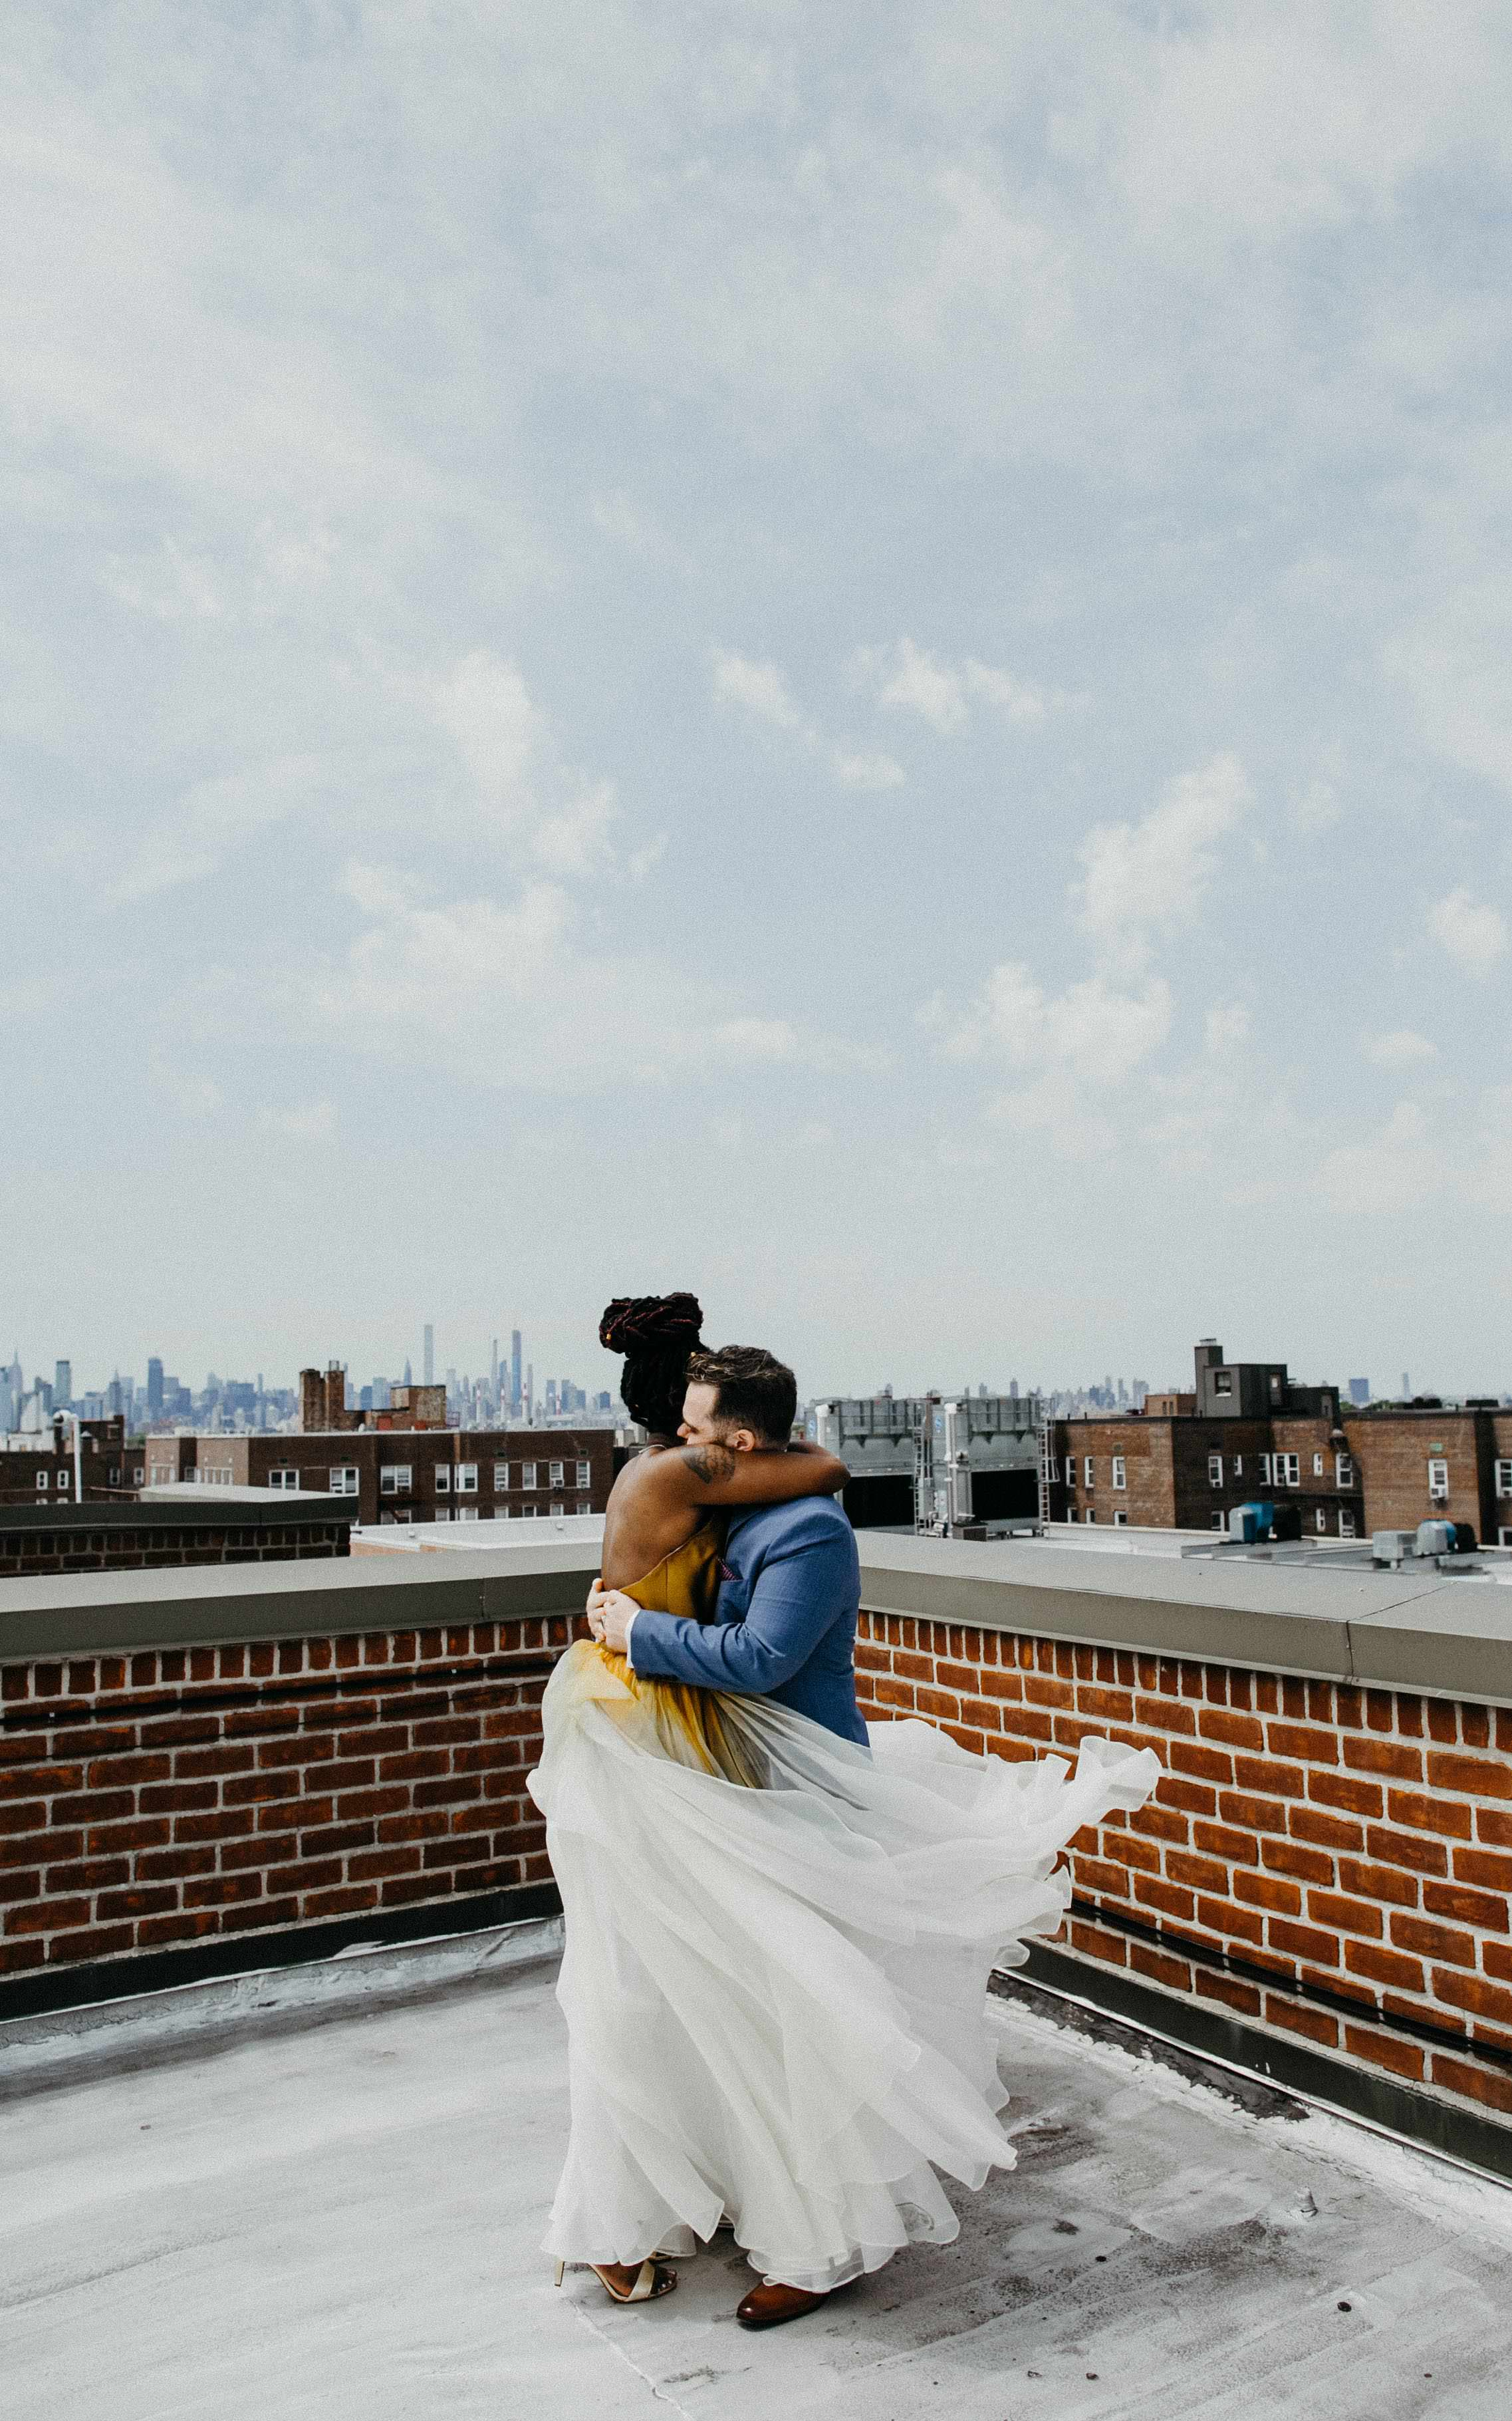 Sevlynn-Photography-Wedding-LIC-Landing-Maiella-NYC-2.jpg